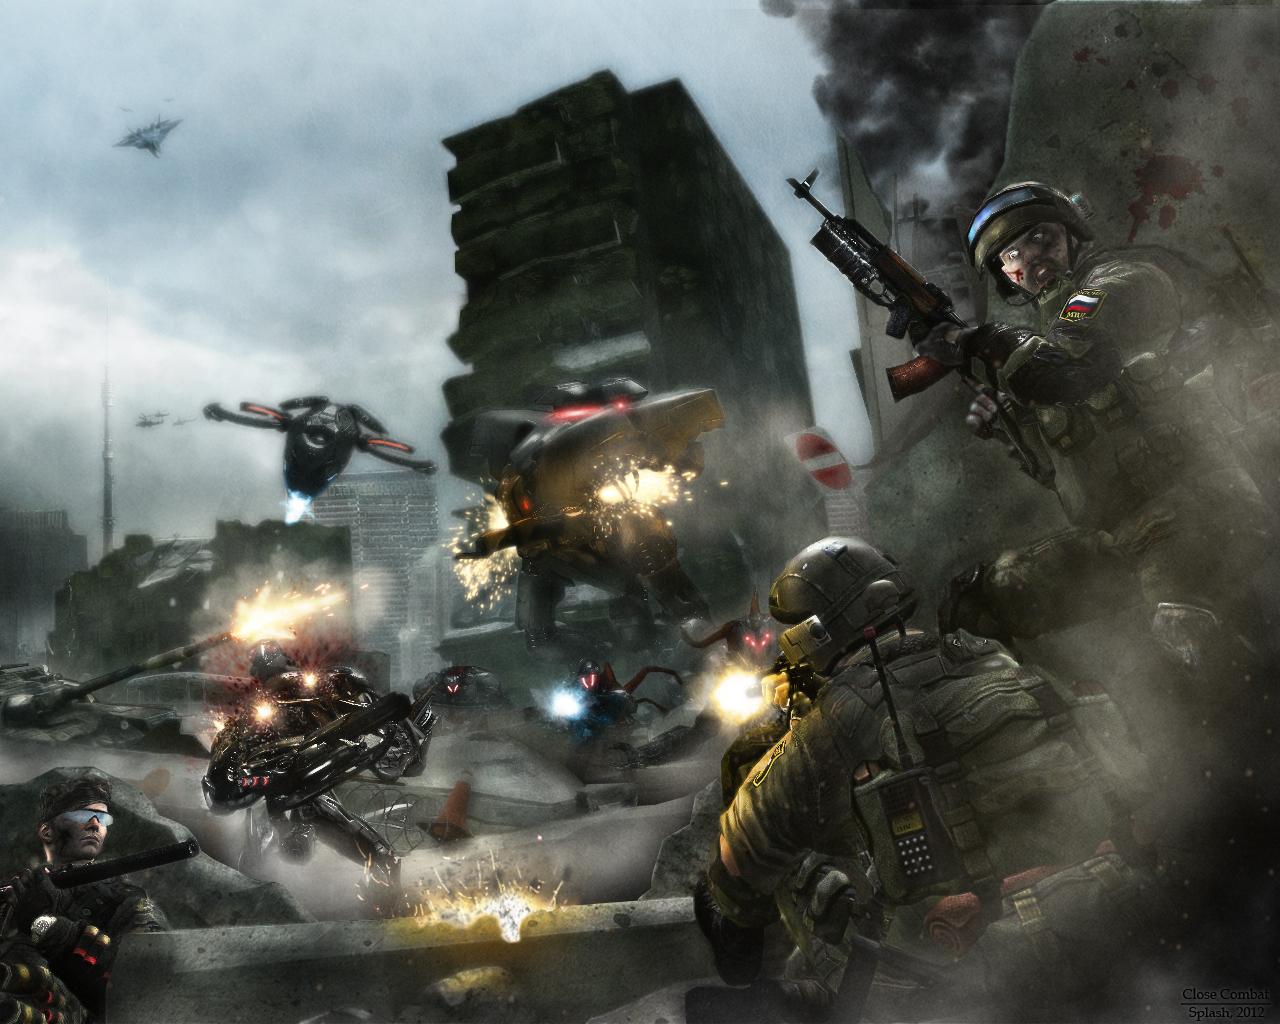 http://fc05.deviantart.net/fs70/f/2012/044/5/3/close_combat_by_sp1ash-d4pm73h.jpg